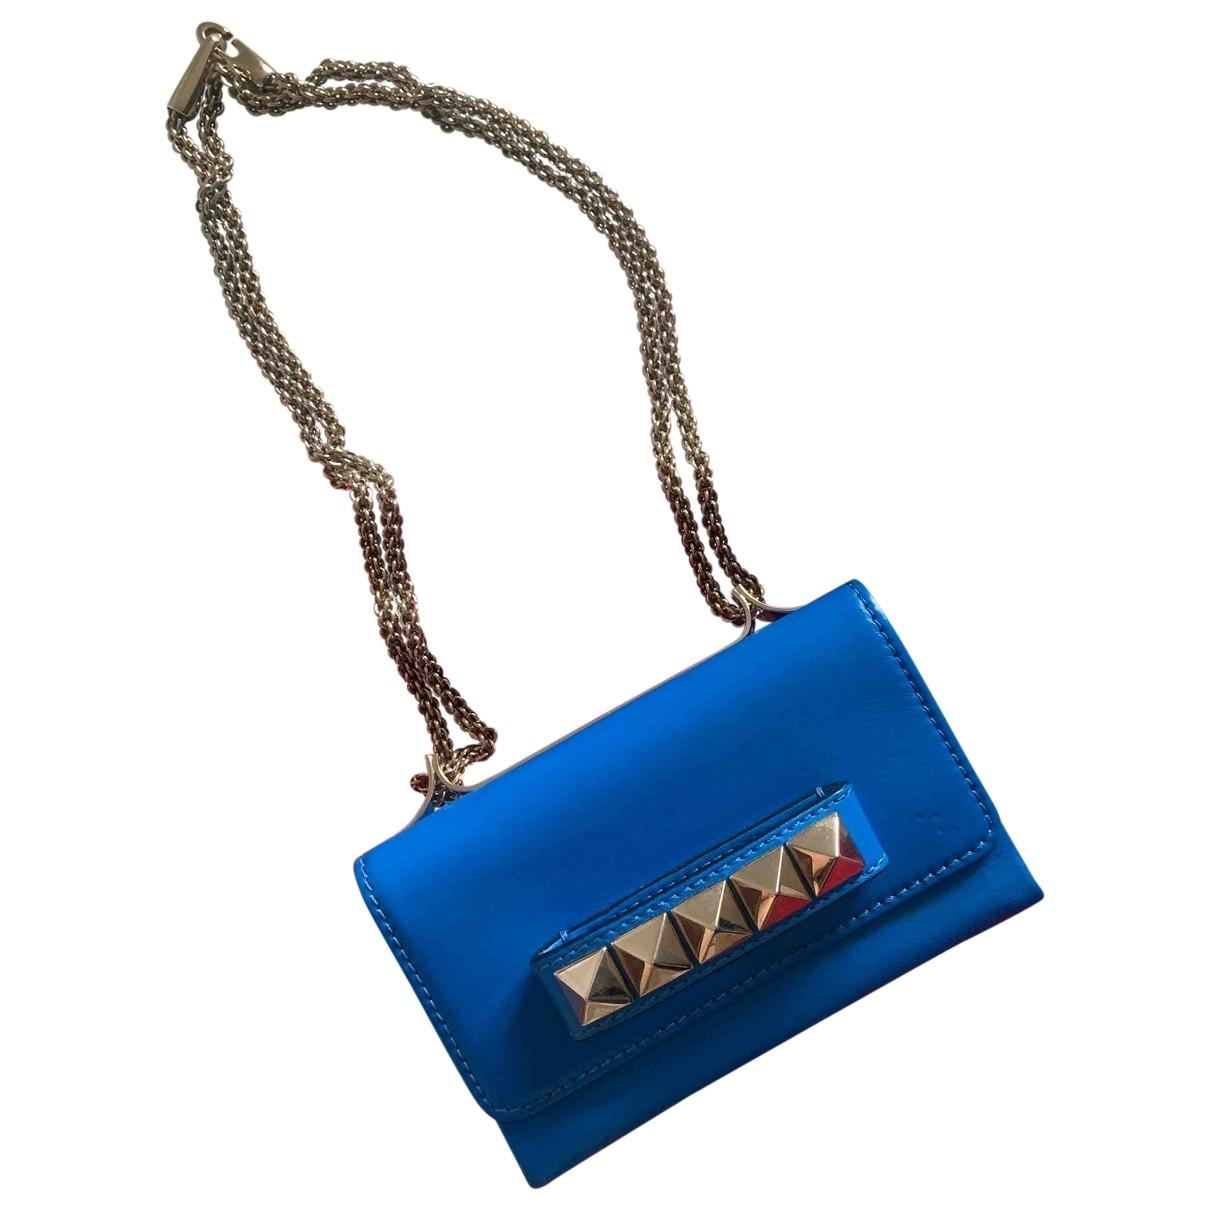 Valentino Garavani Vavavoom Blue Leather Clutch bag for Women \N